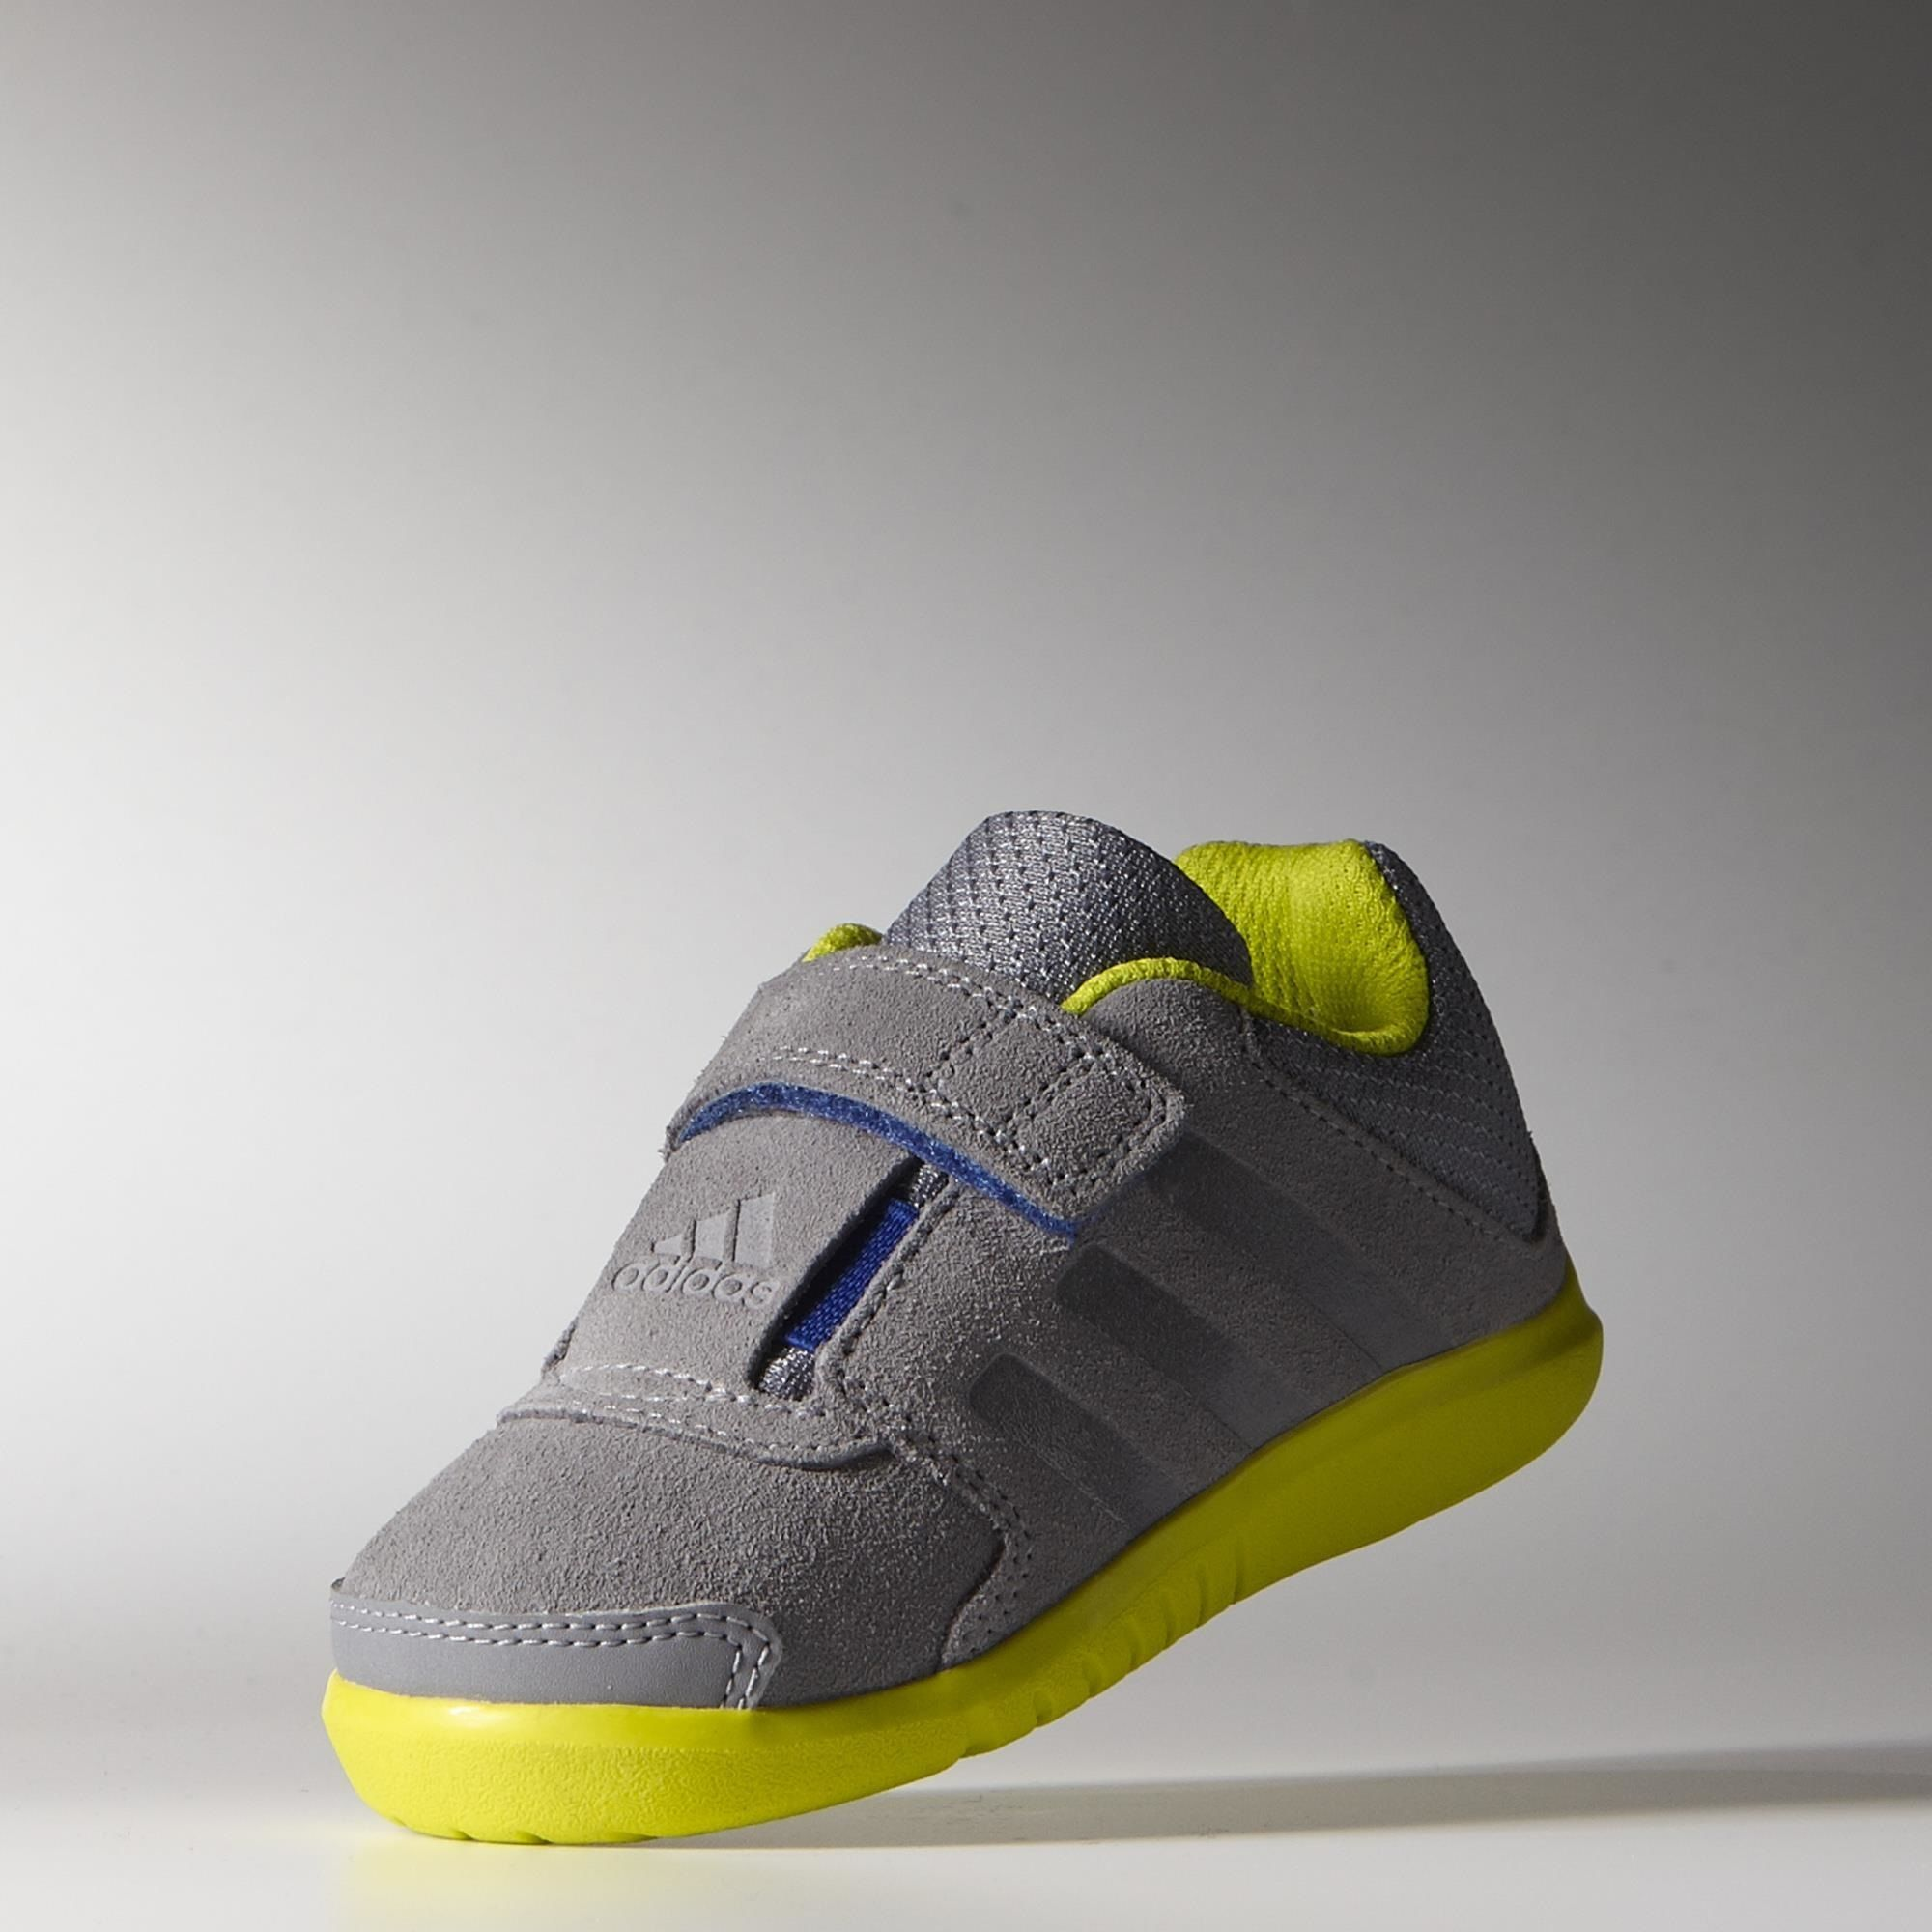 Adidas Katnat 3 Schoenen Adidas Nederland Sneakers Shoes Adidas